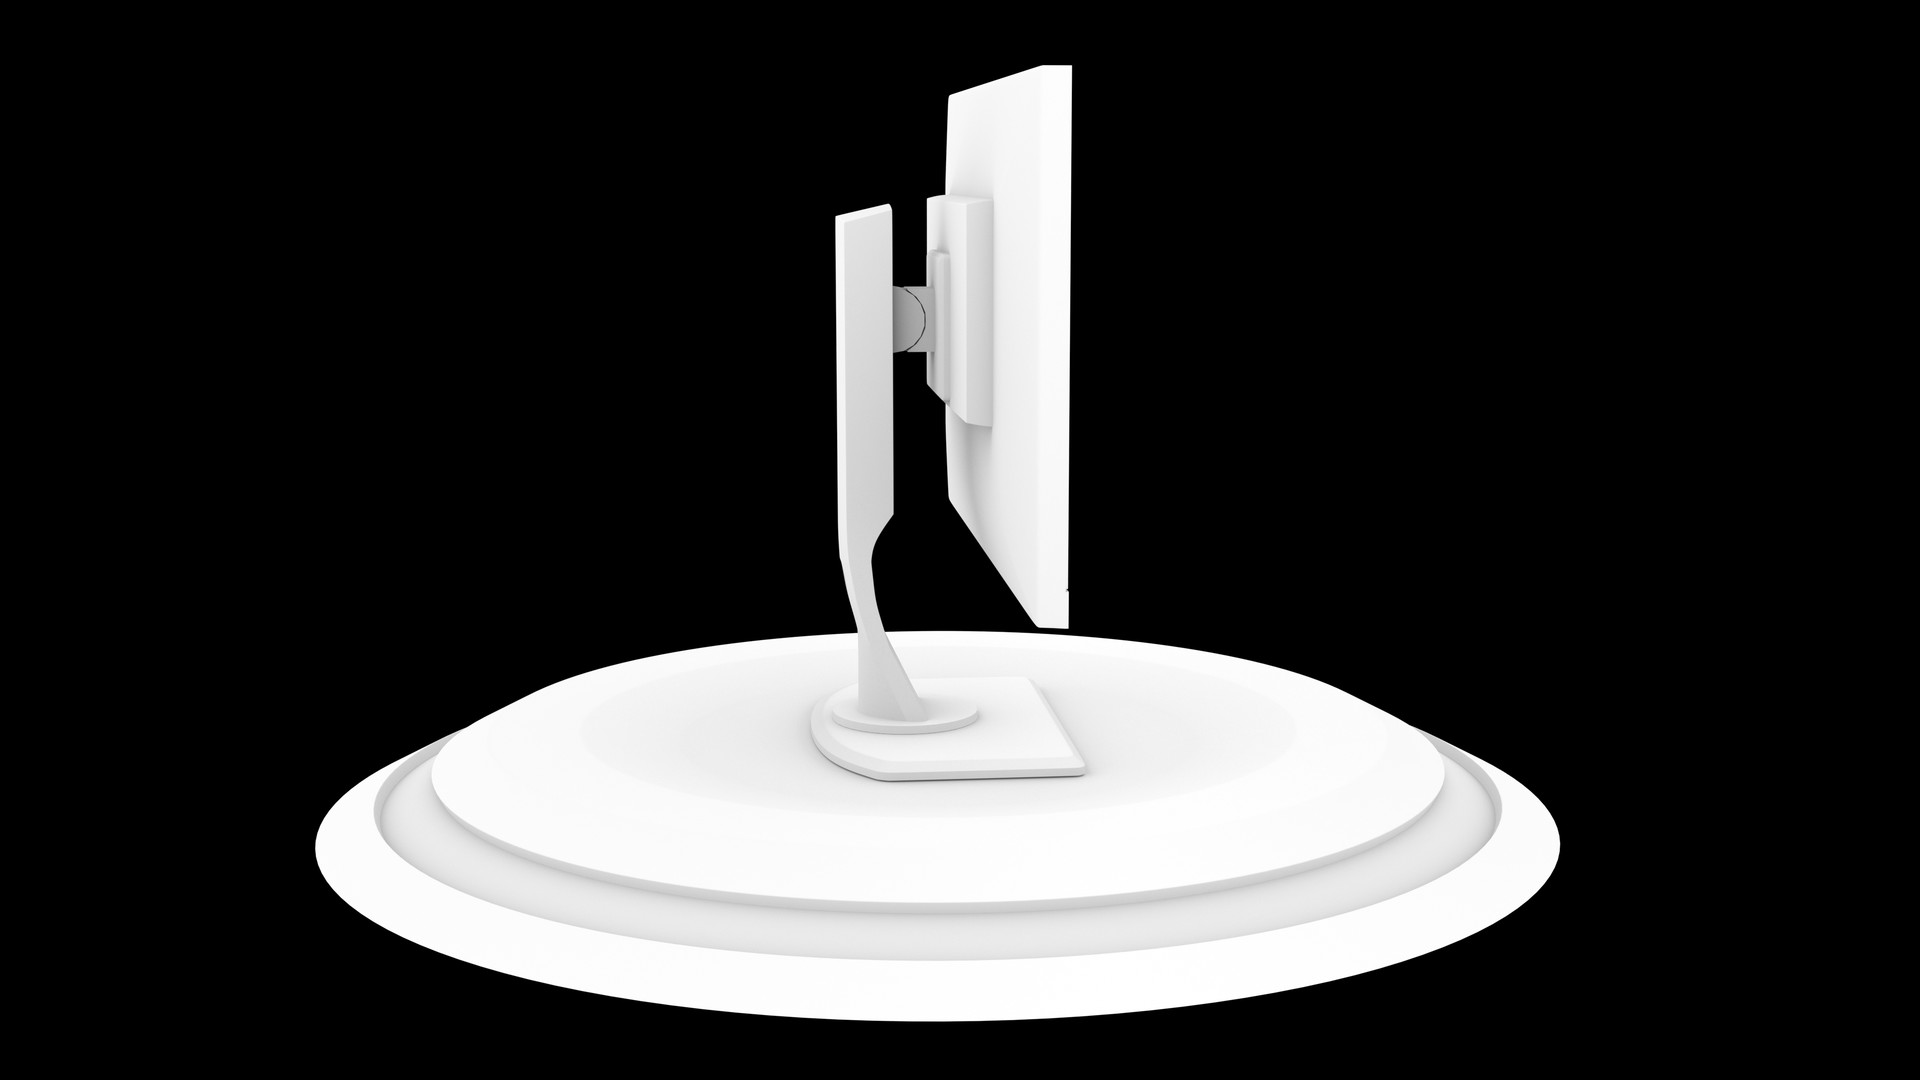 Thryth ri wip 4k frame